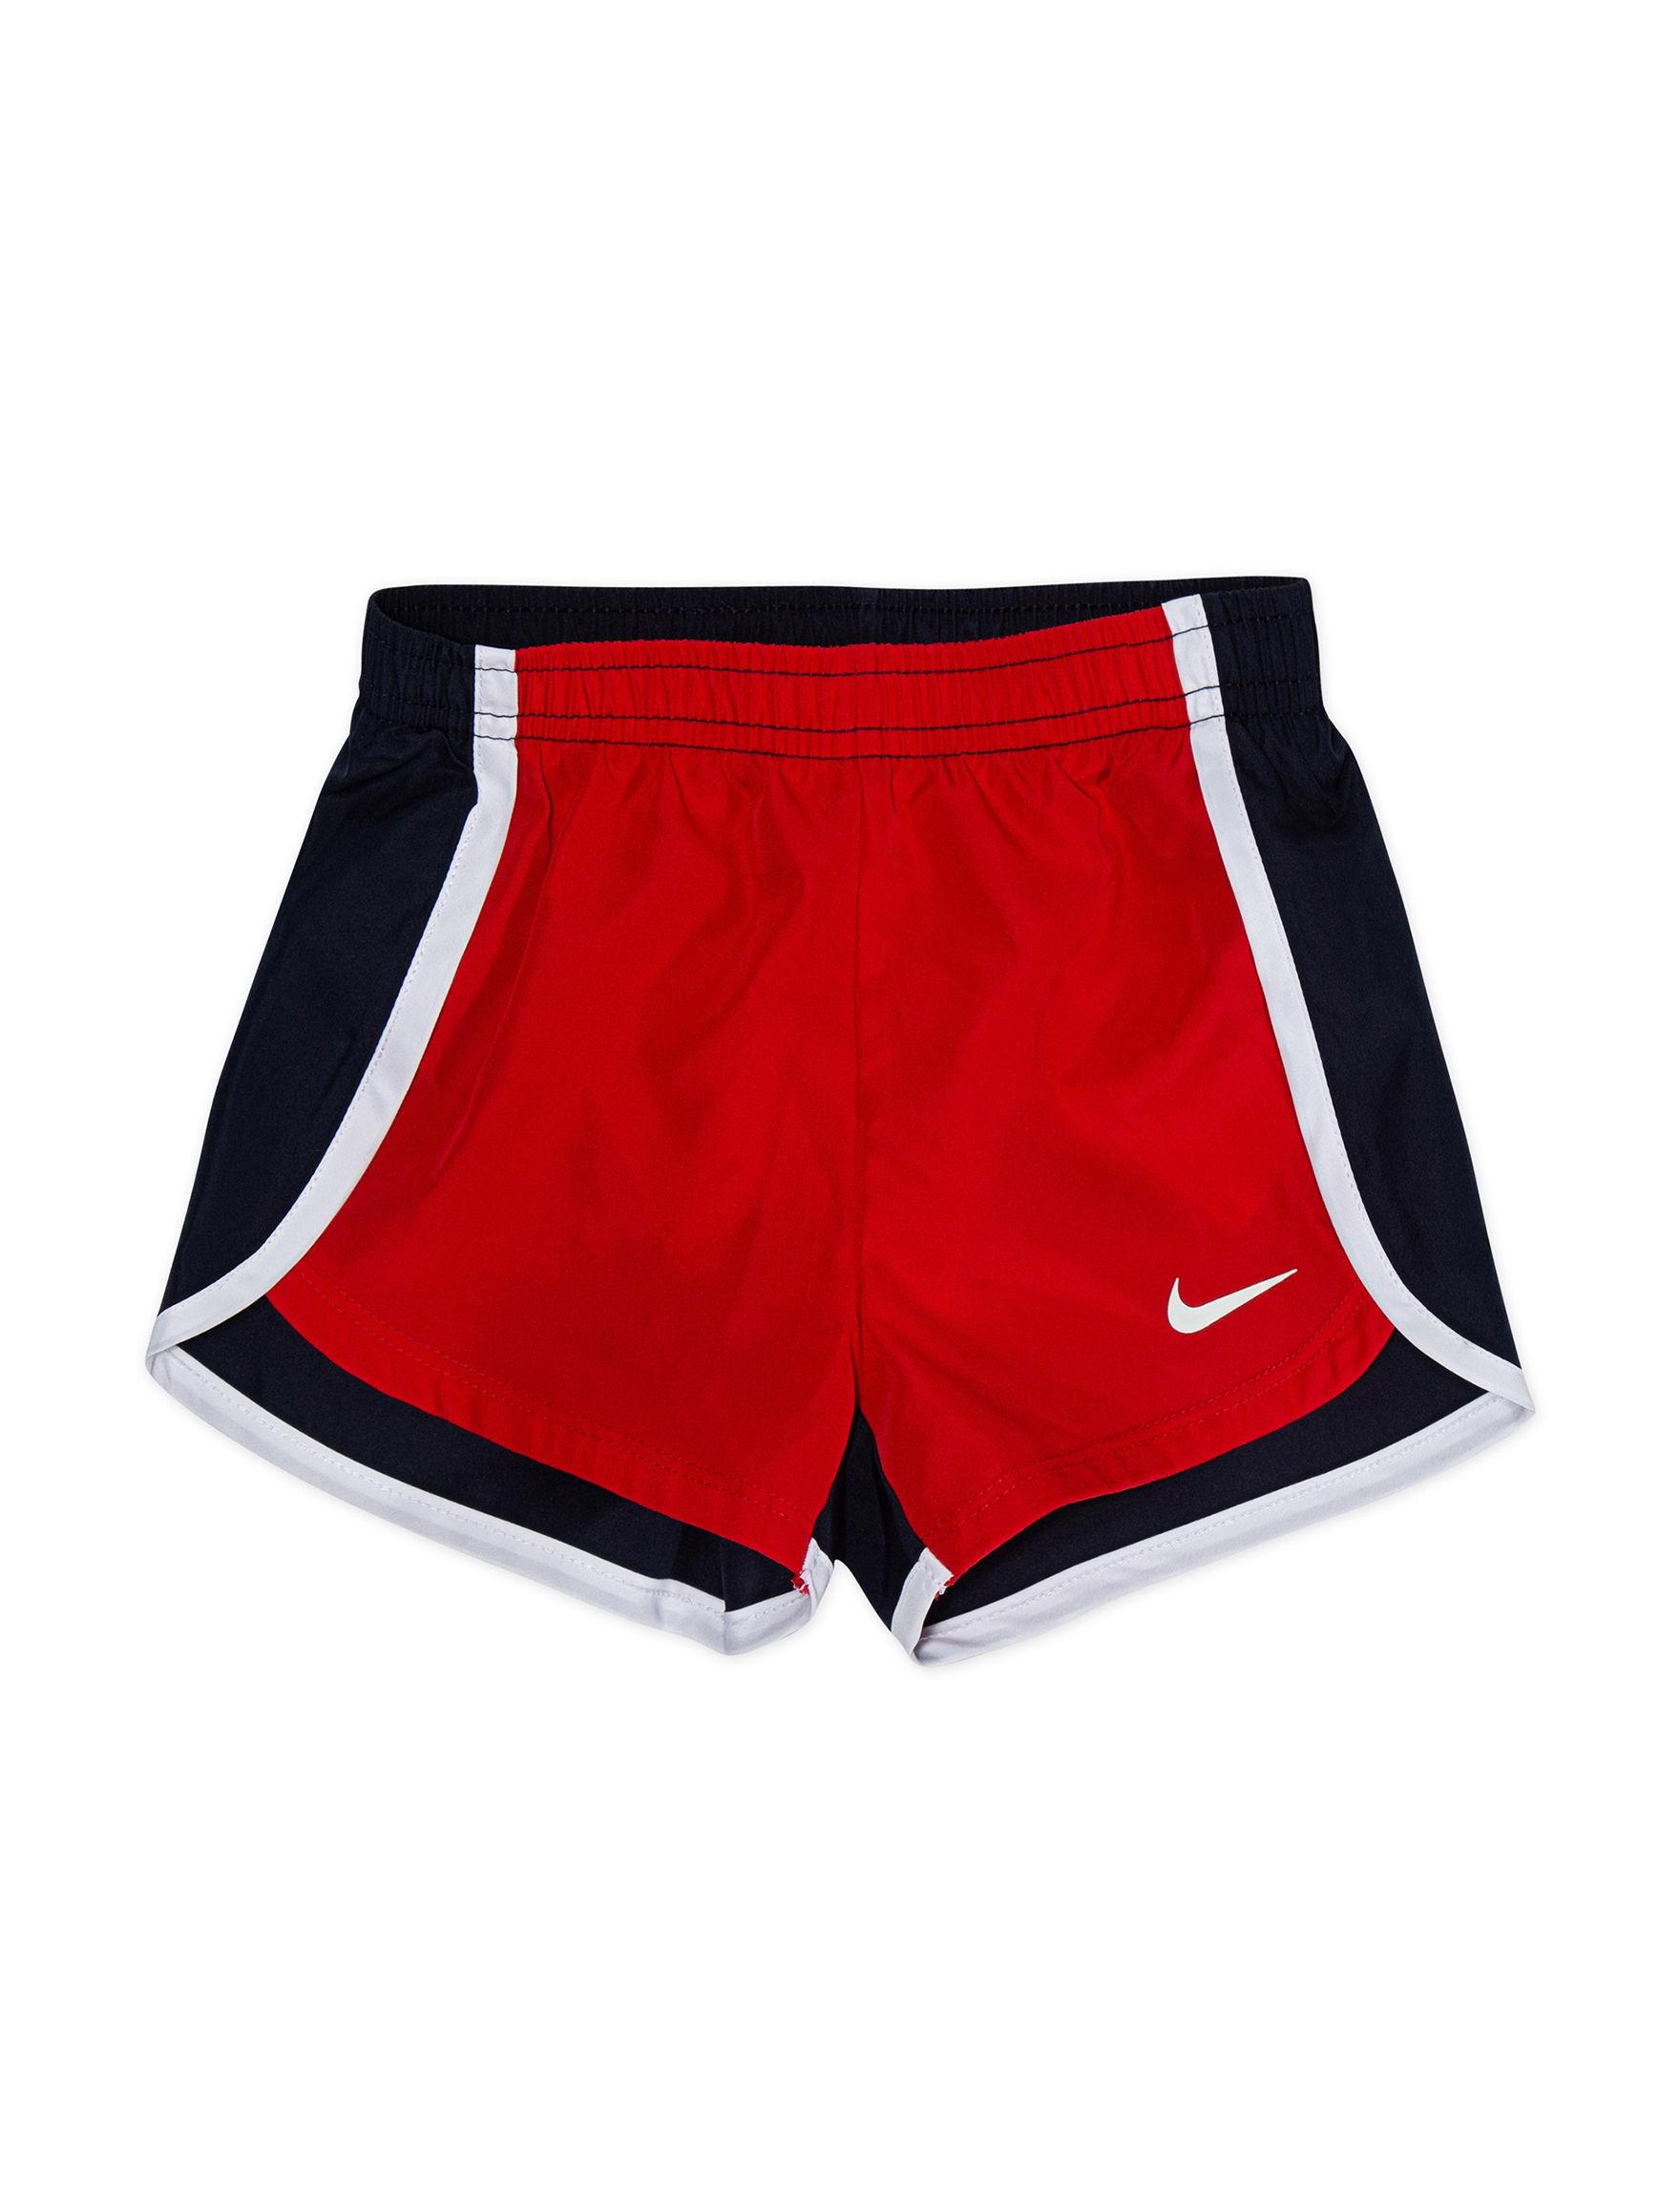 Nike University Red / Black